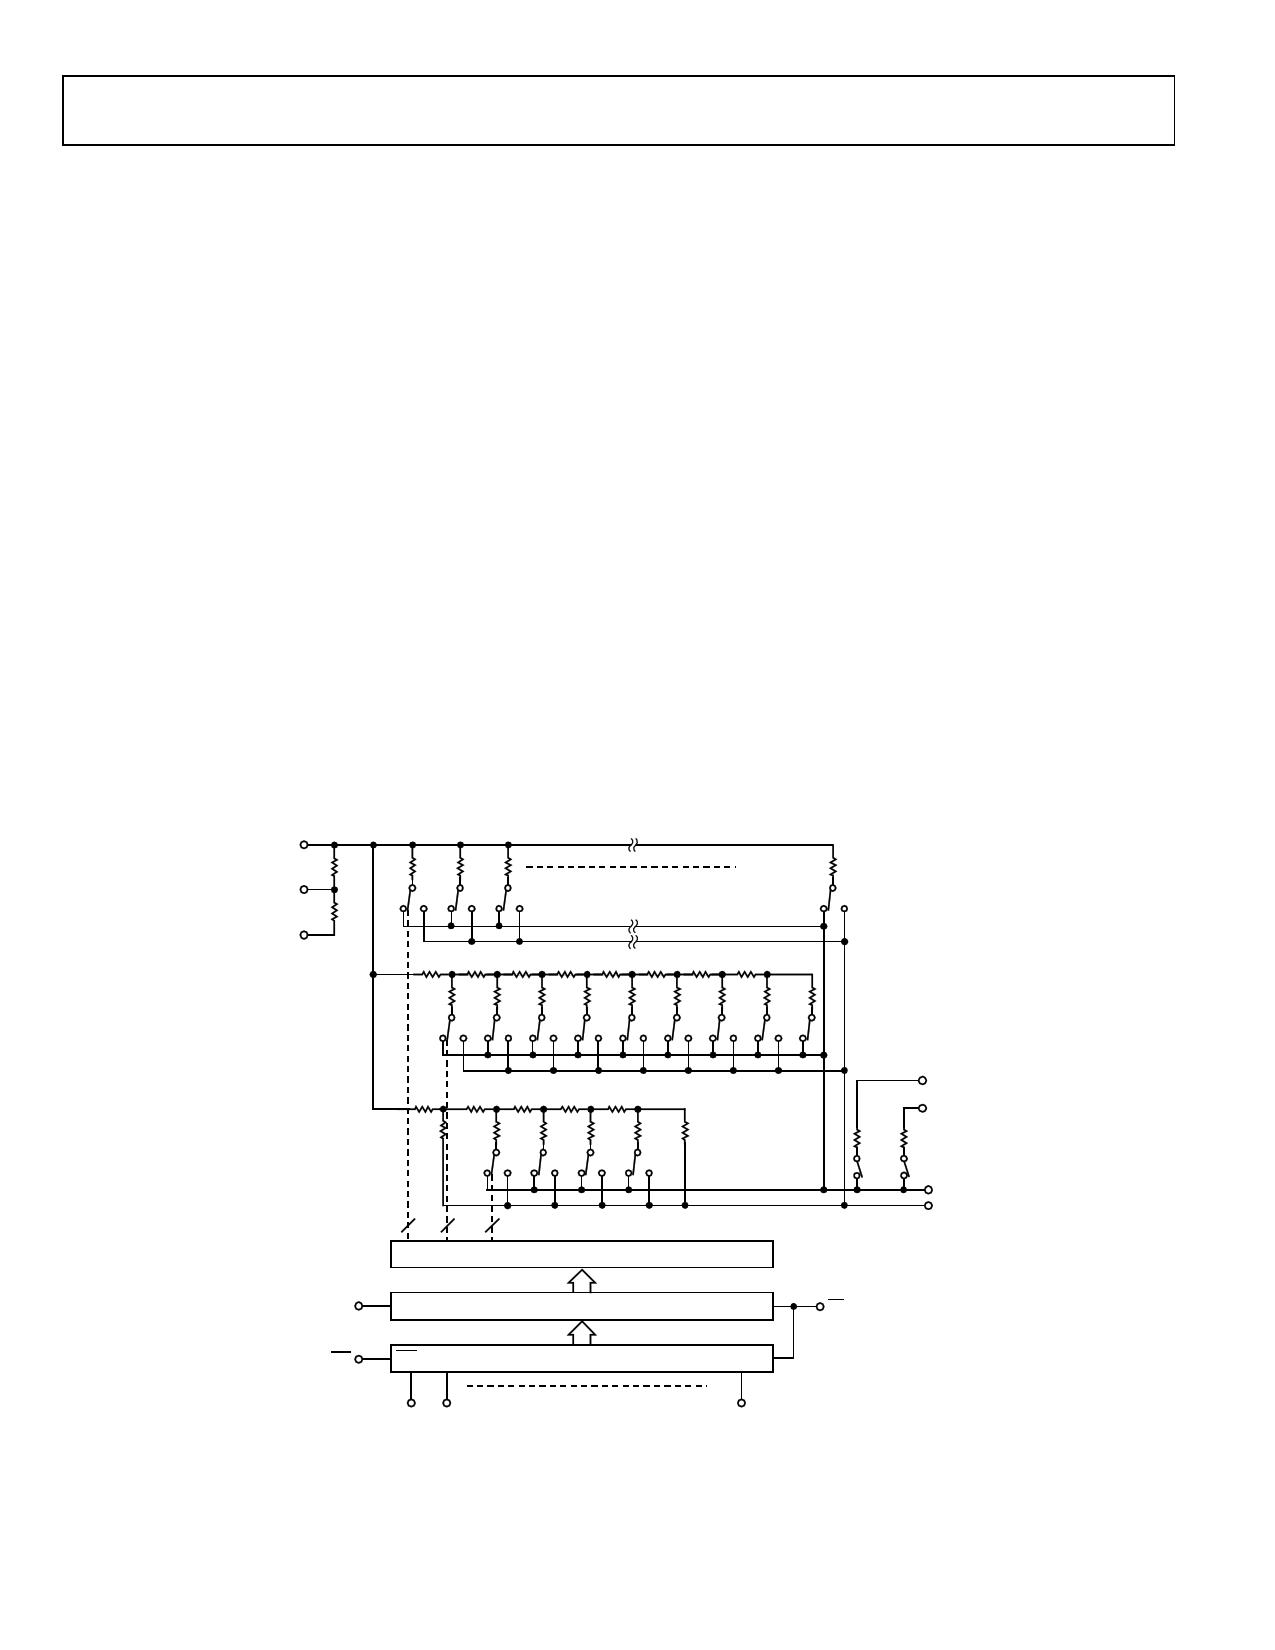 AD5546 arduino